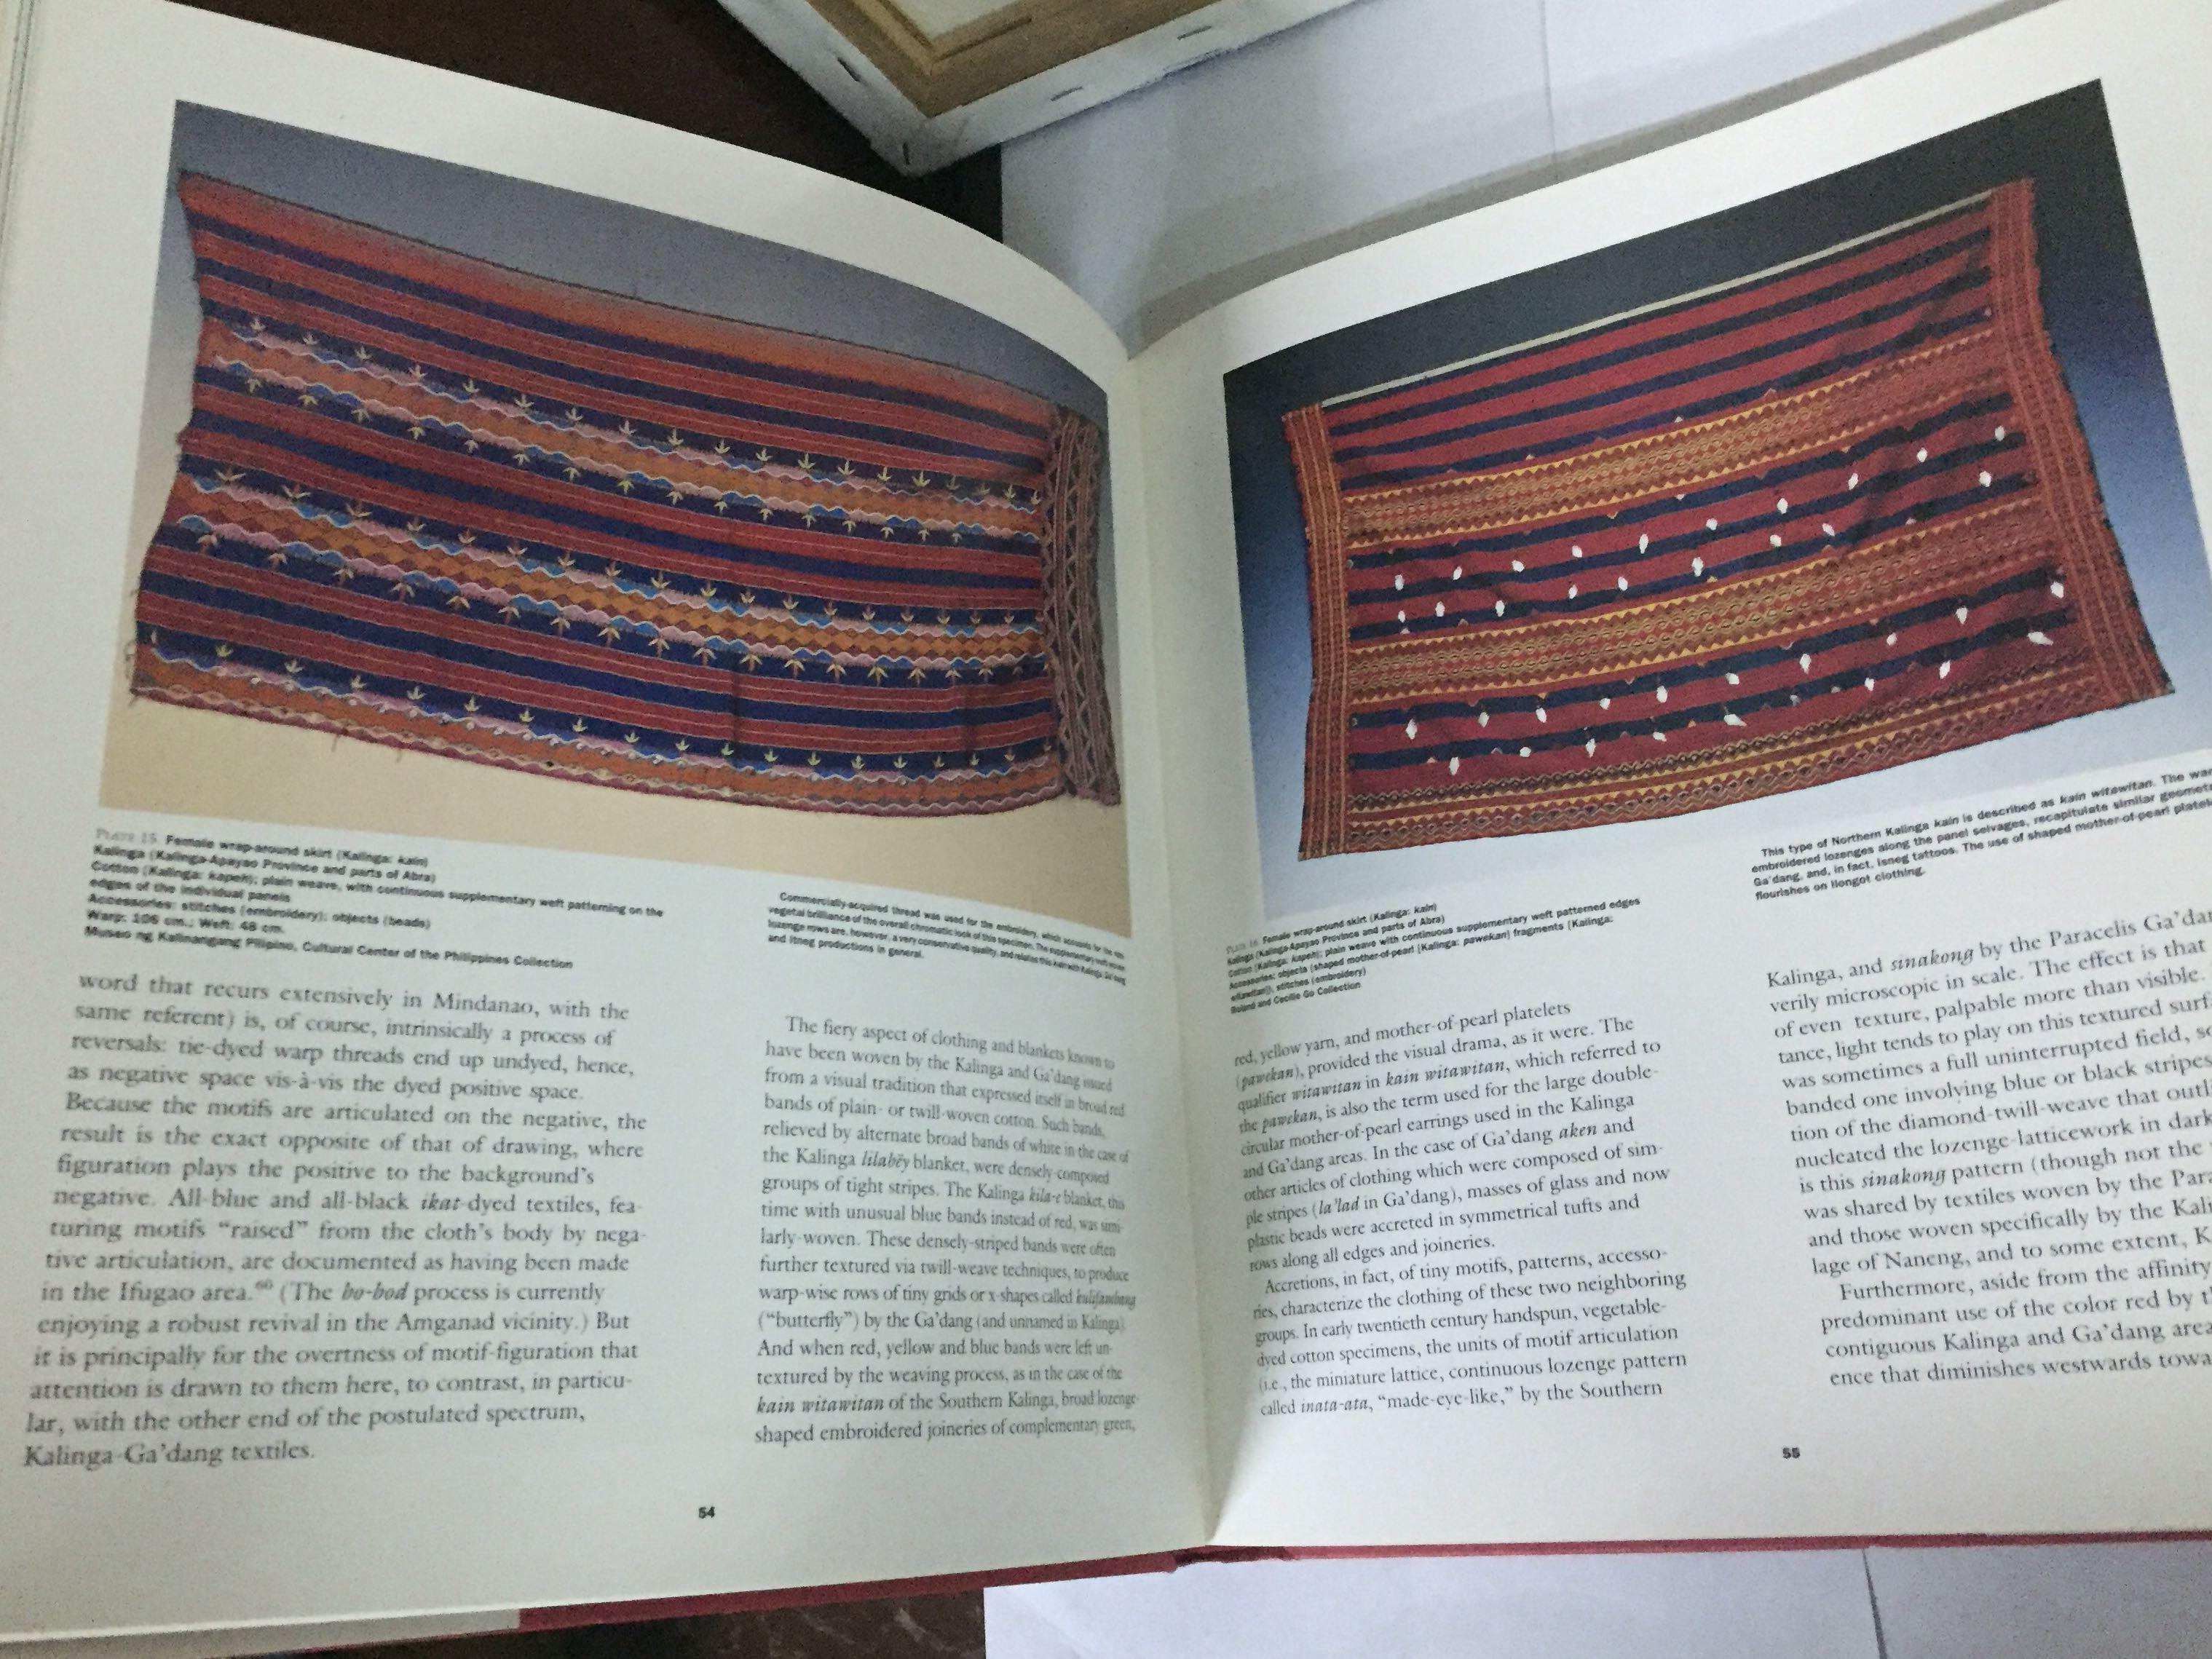 Sinaunang Habi: Philippine Ancestral Weave - Large Hardcover Coffee Table Book on Filipino Weaving